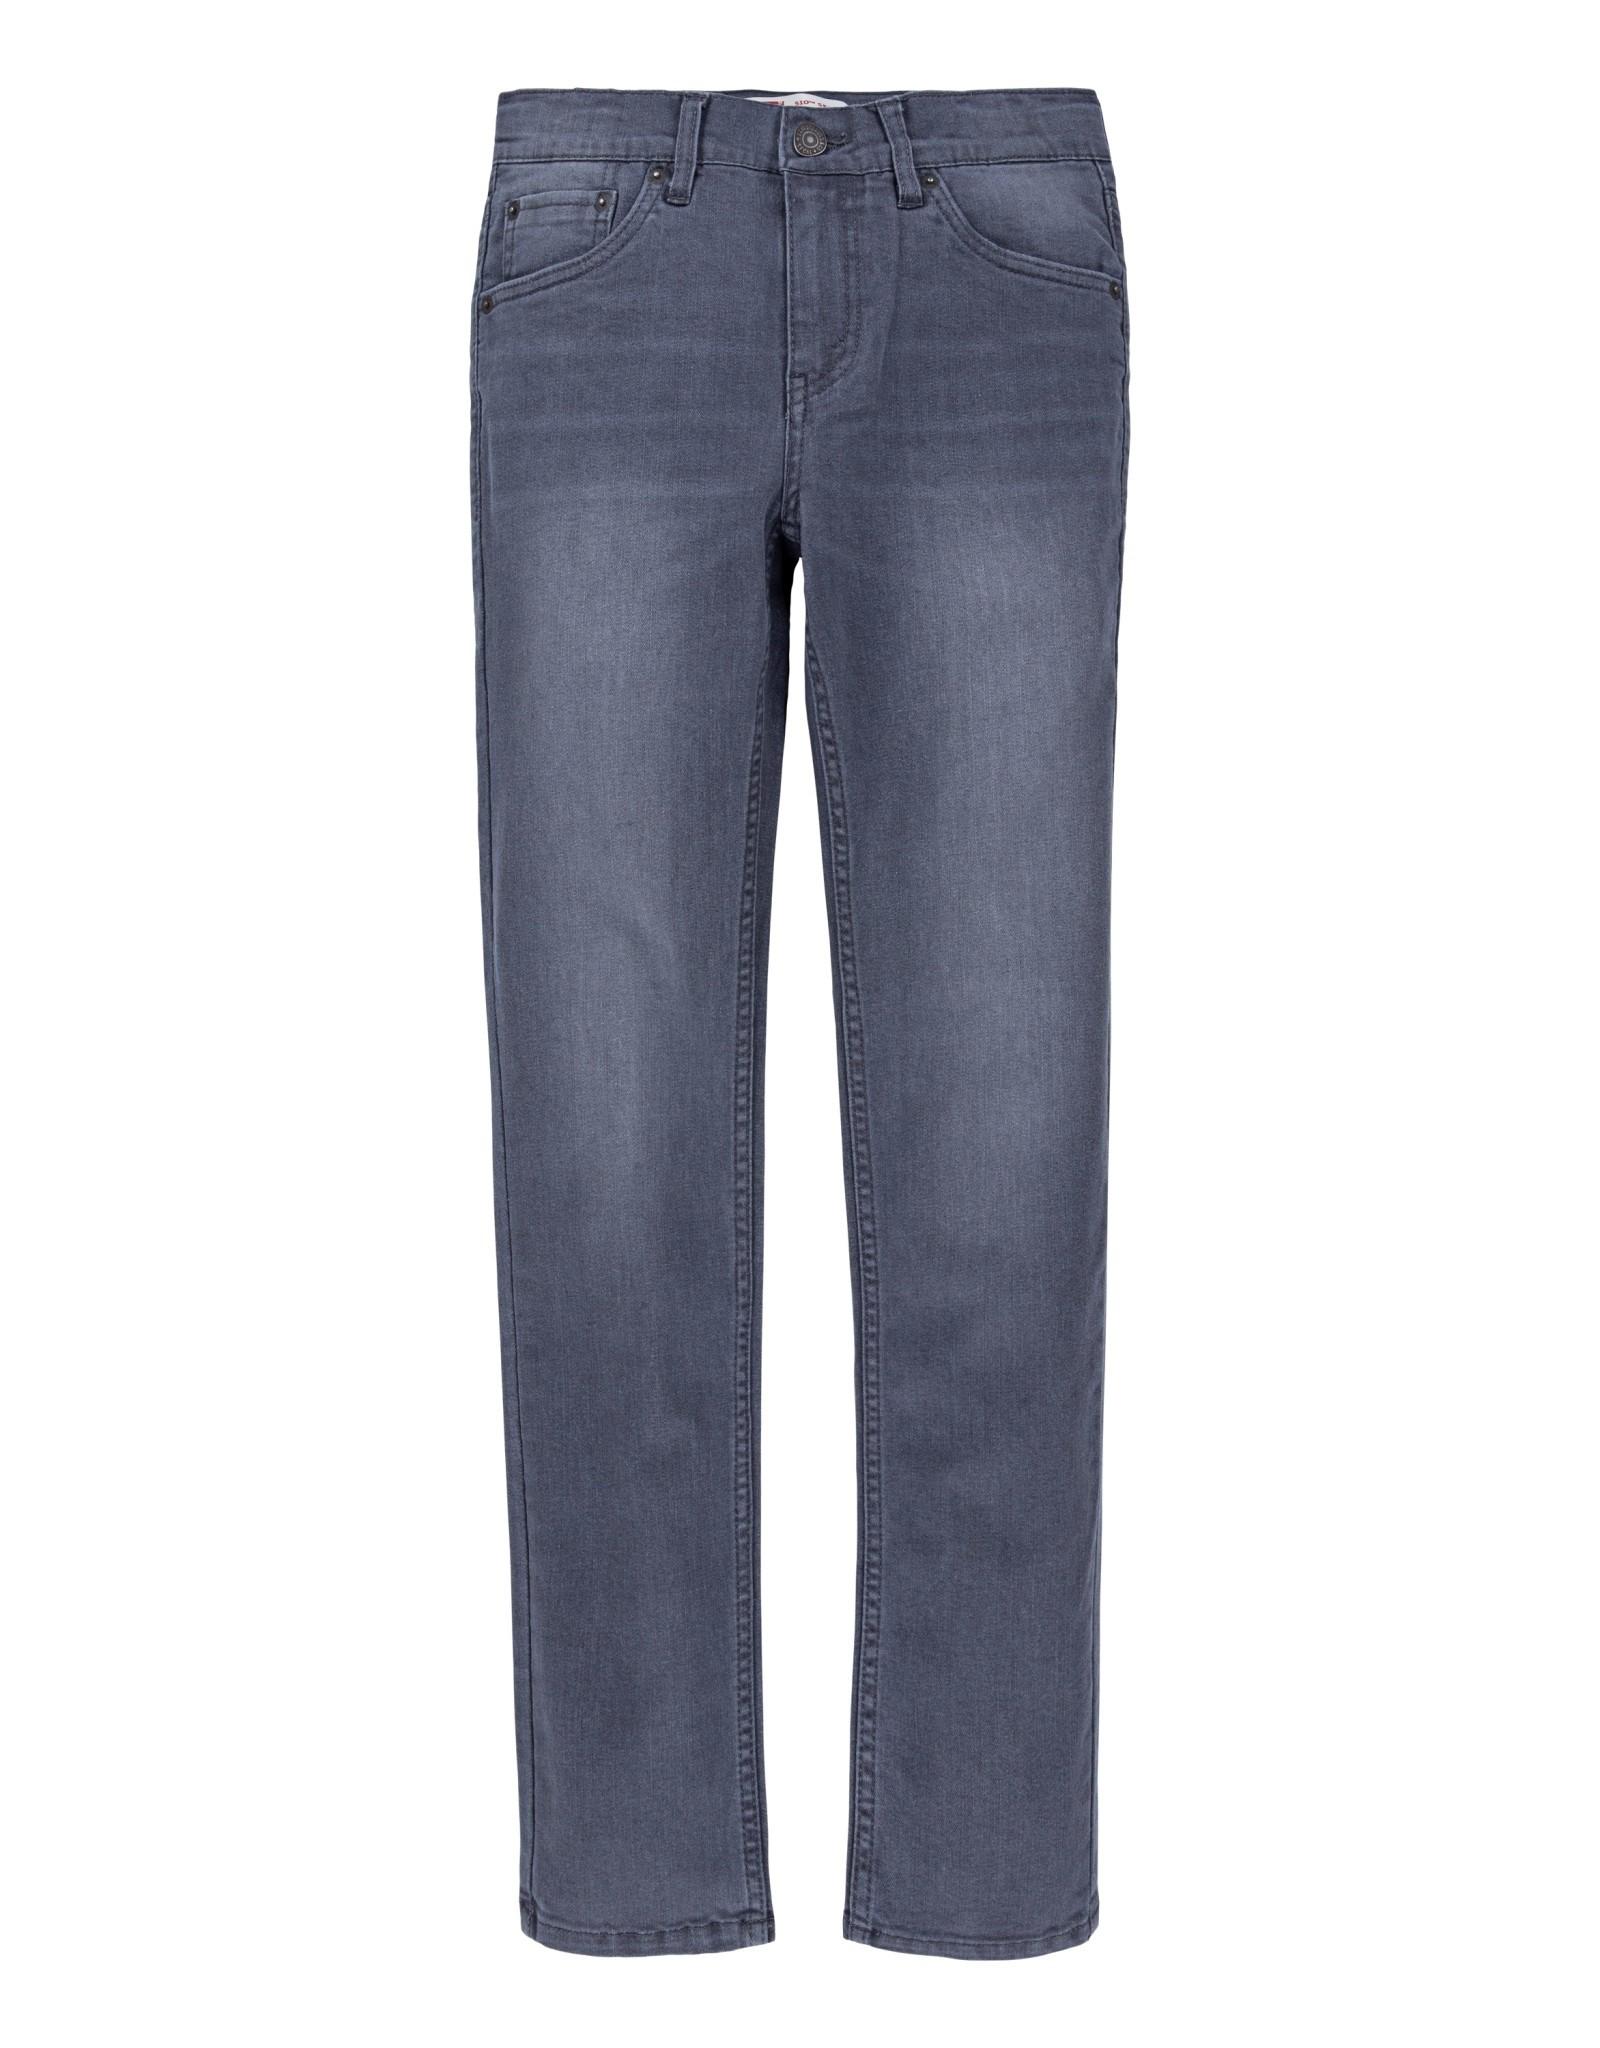 LEVI'S LEVI'S lvb 510 skinny fit jeans millennium